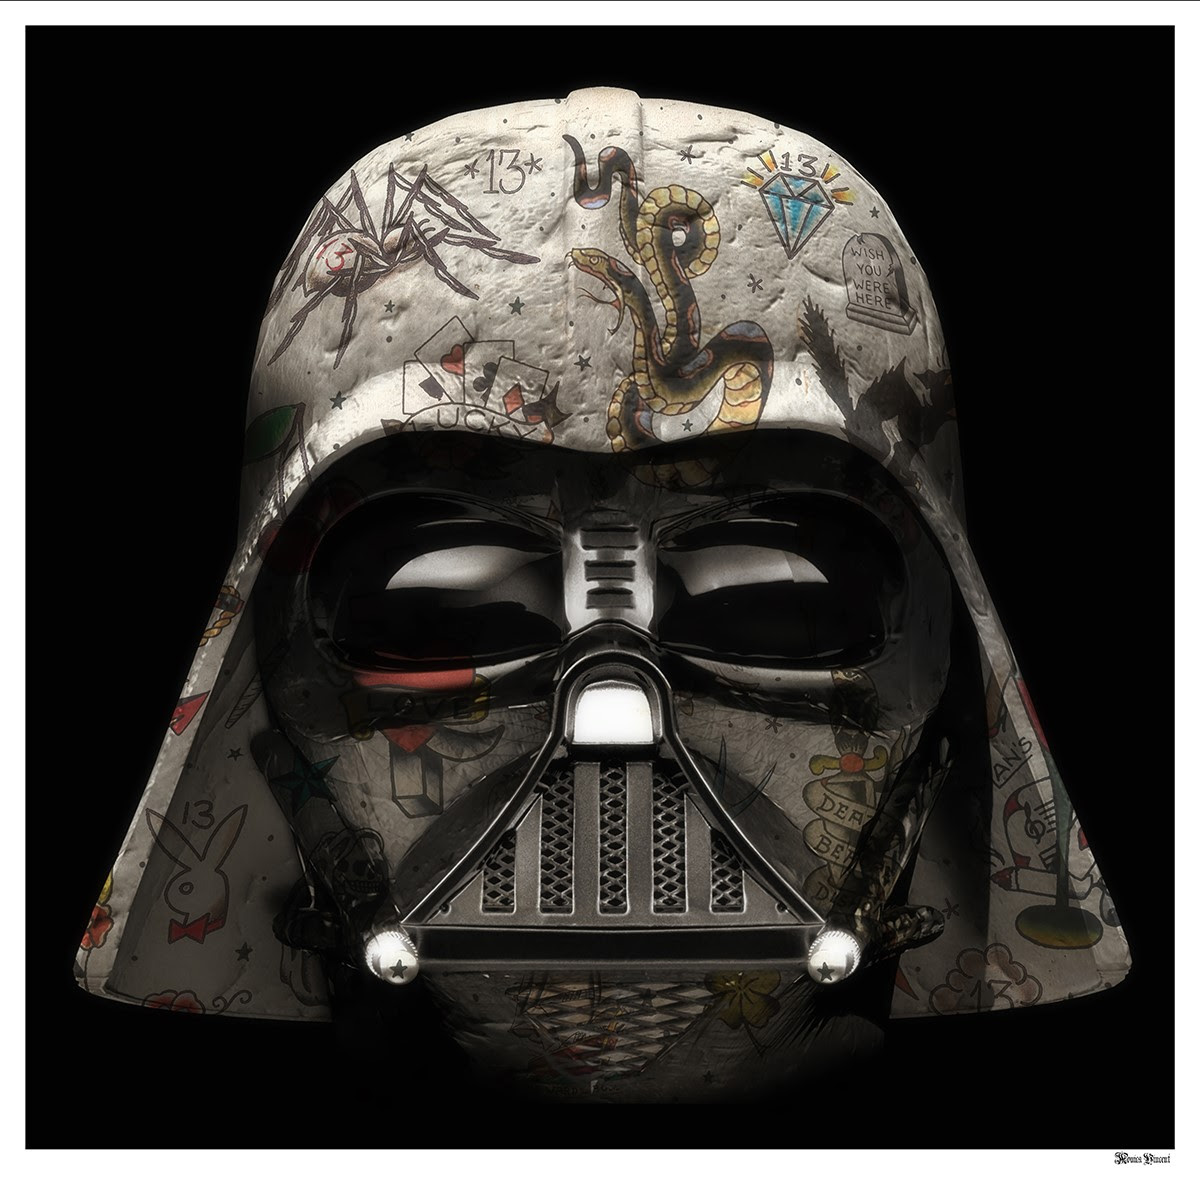 The Dark Lord - Darth Vader (Black Background) - Large - Framed by Monica Vincent